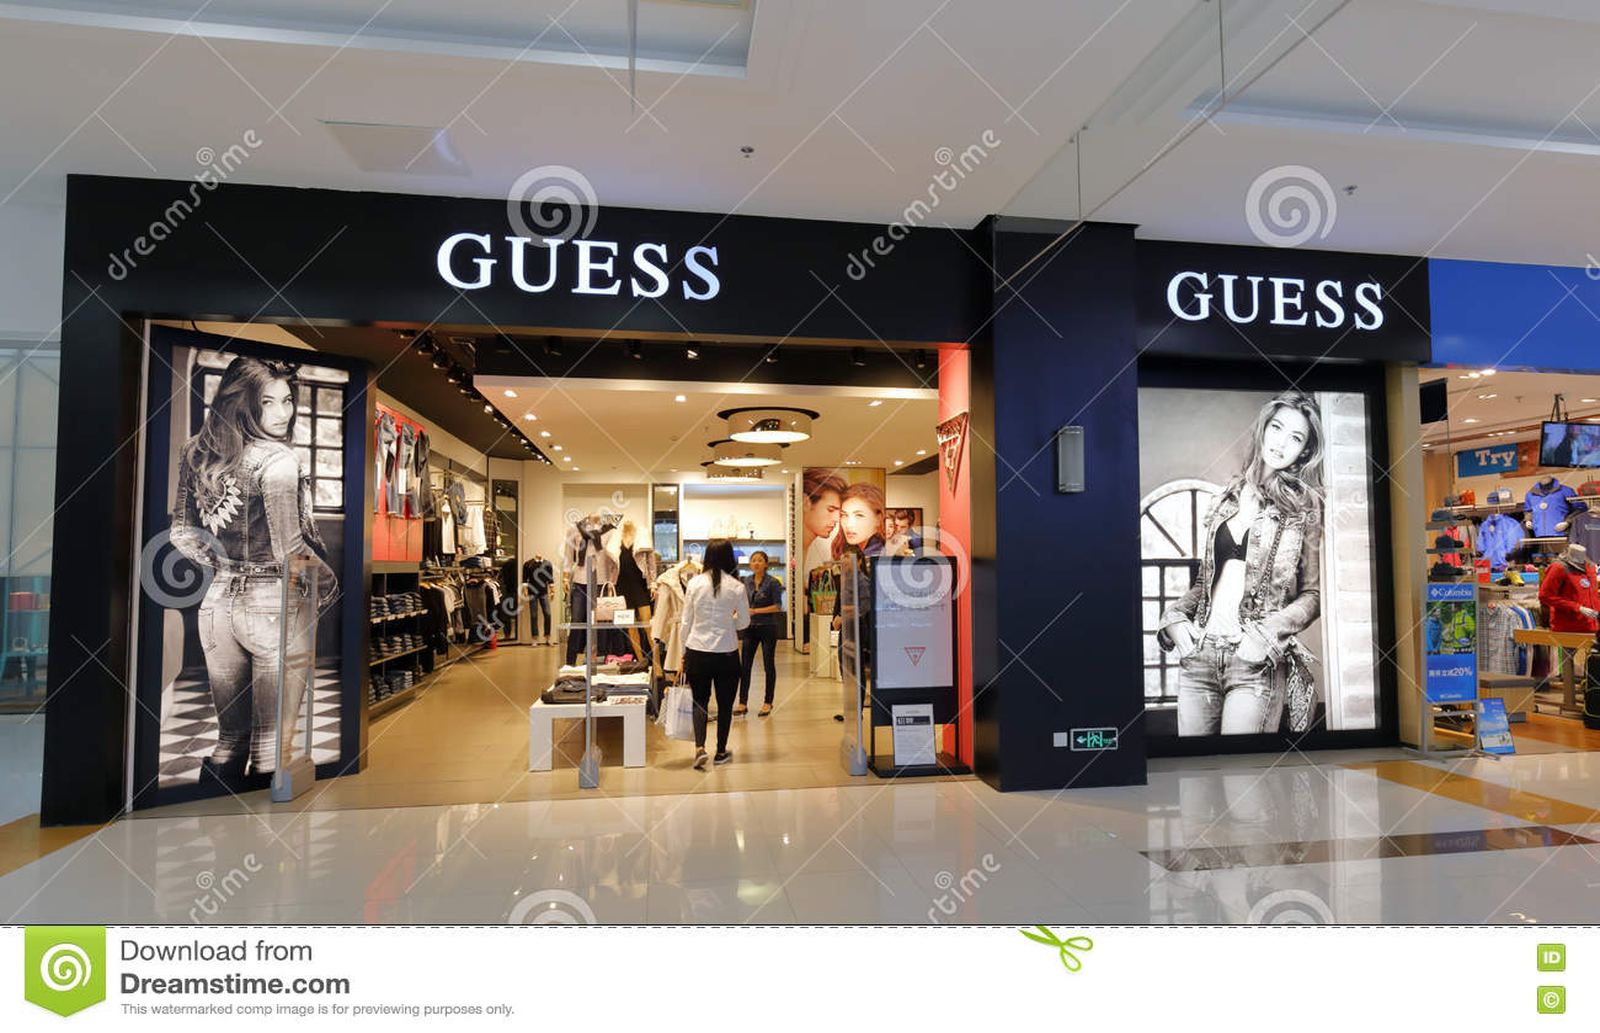 Fashion house clothing store